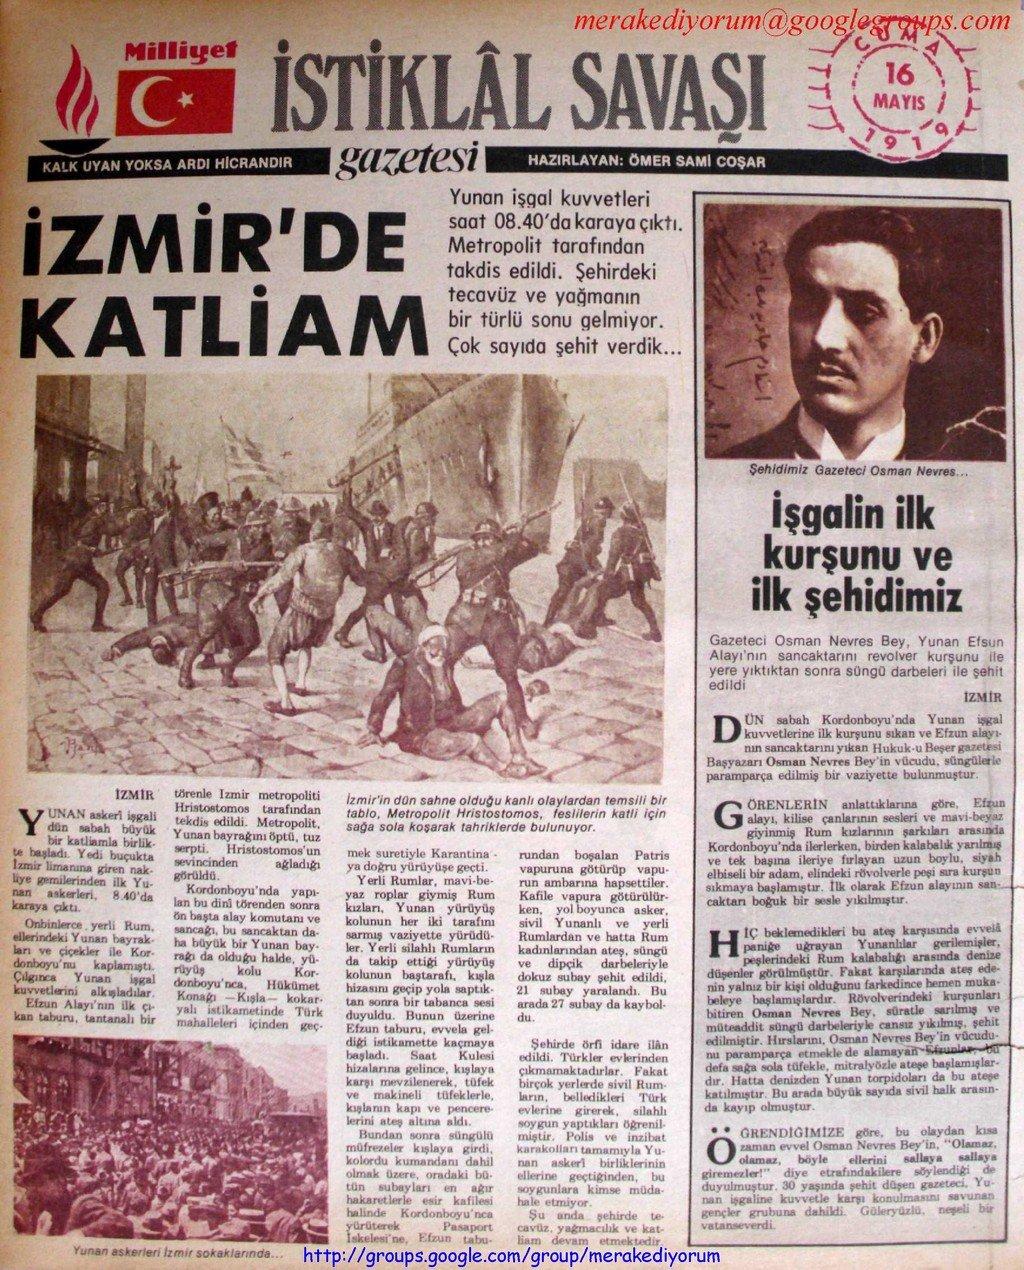 istiklal savaşı gazetesi - 16 mayıs 1919